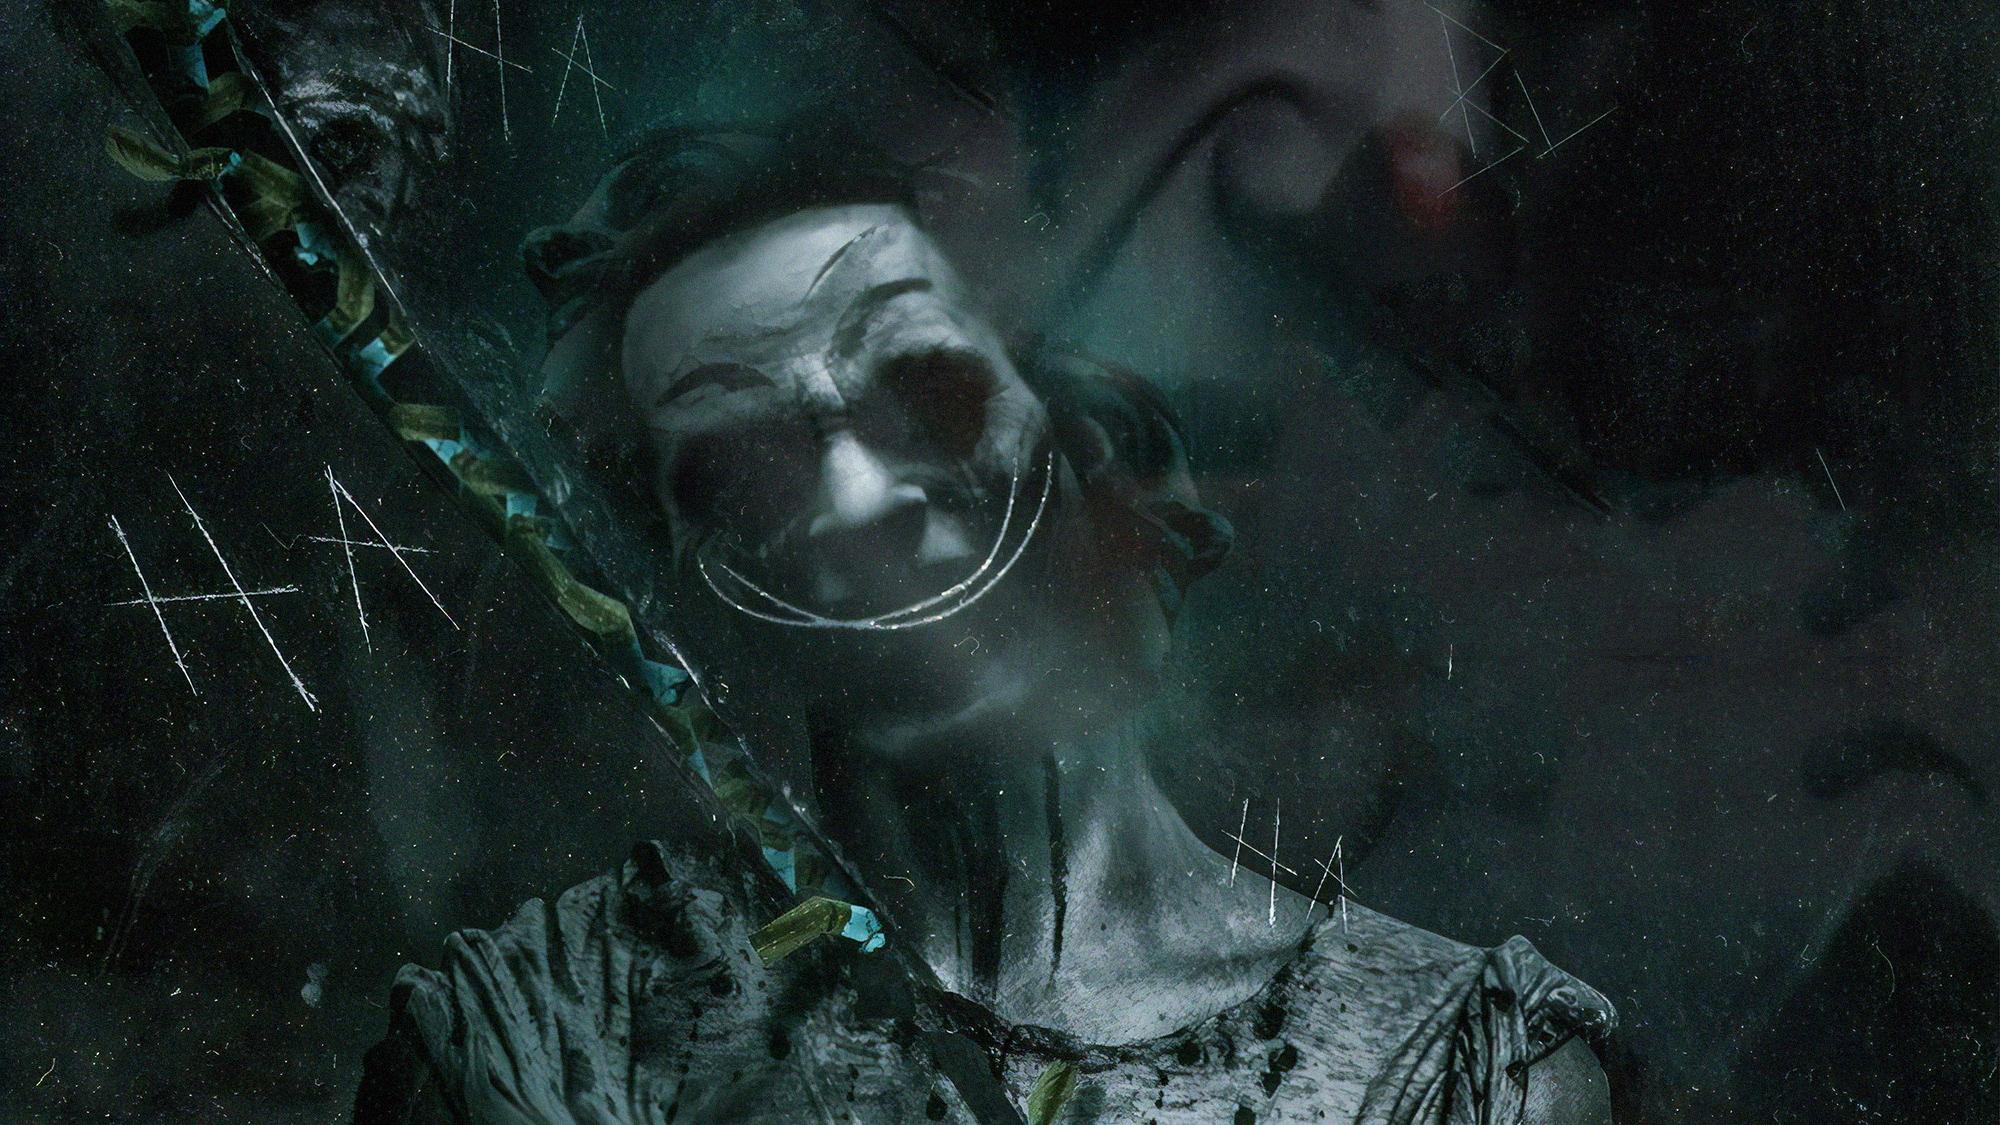 Joker Put On A Happy Face Art Hd Movies 4k Wallpapers